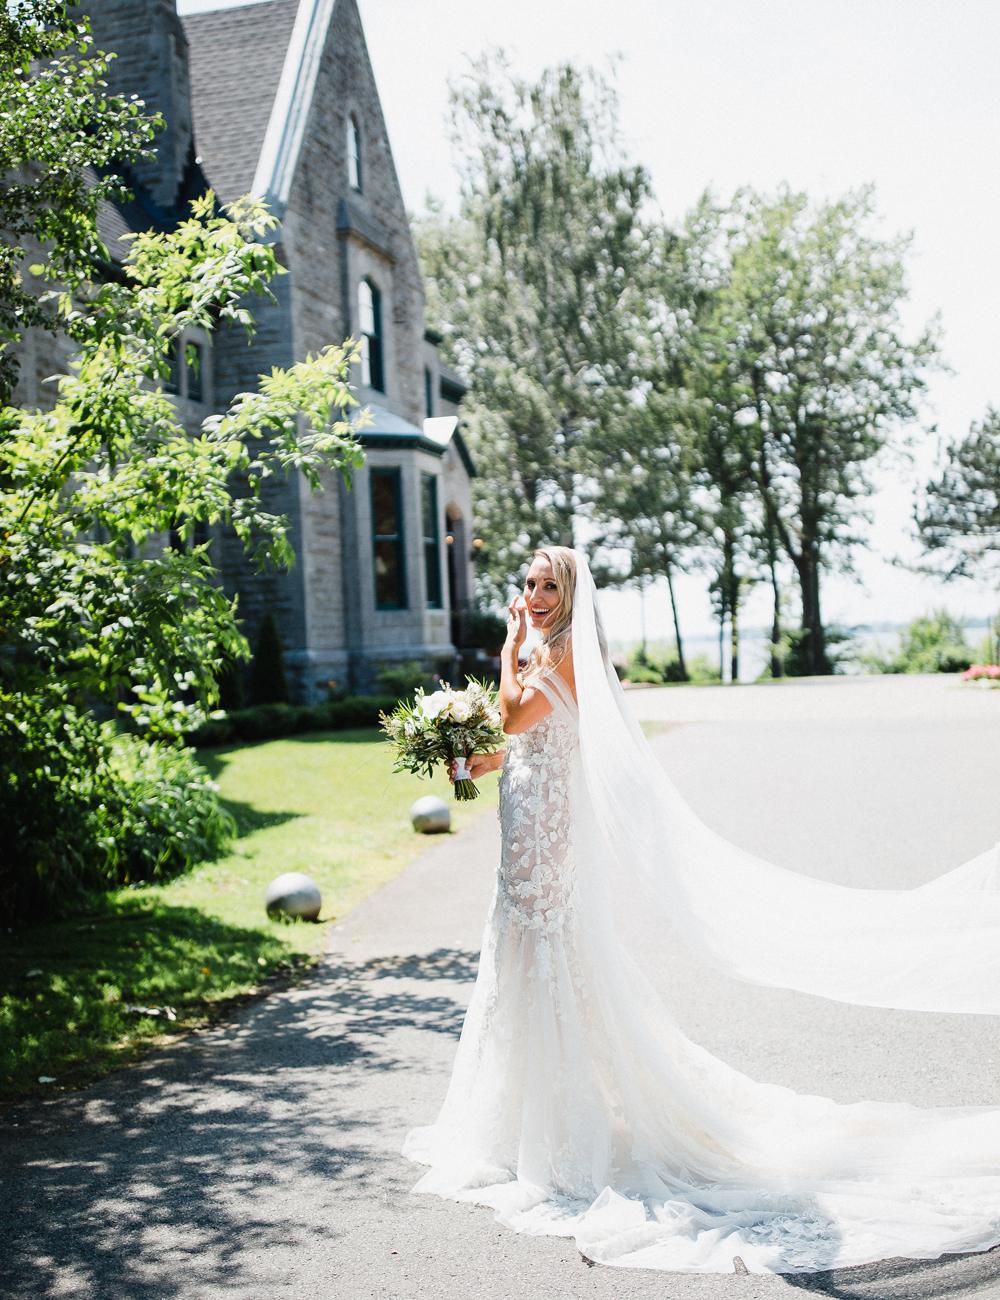 wedding-dress-yaniv-persy-deisgner-luxury